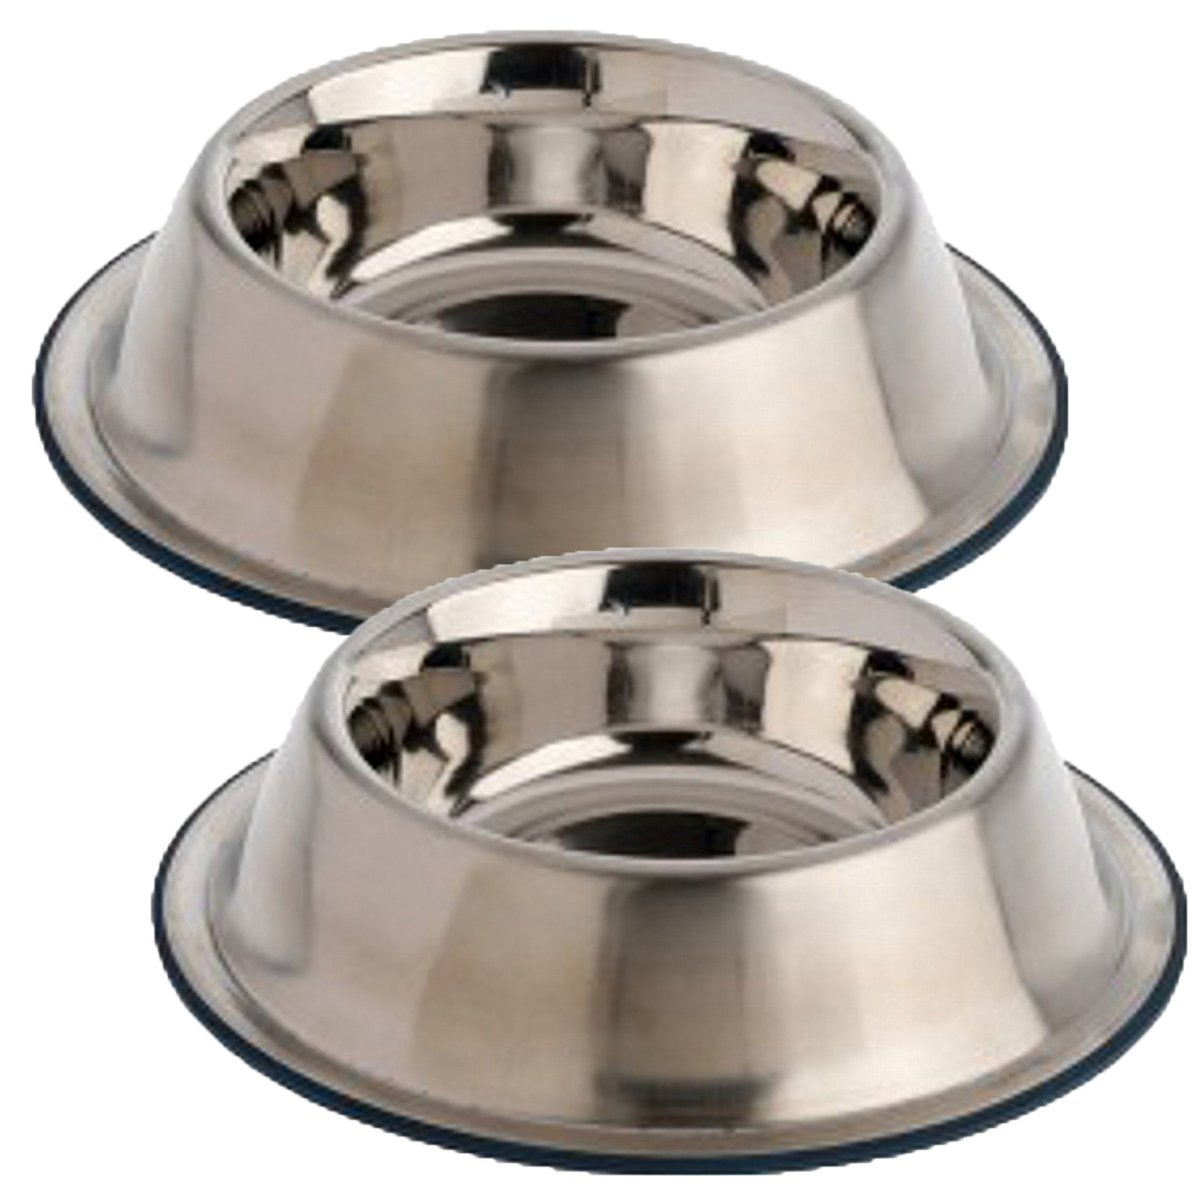 OurPets DuraPet Premium No-Tip Stainless Steel Pet Bowls, Medium (2 Pack)